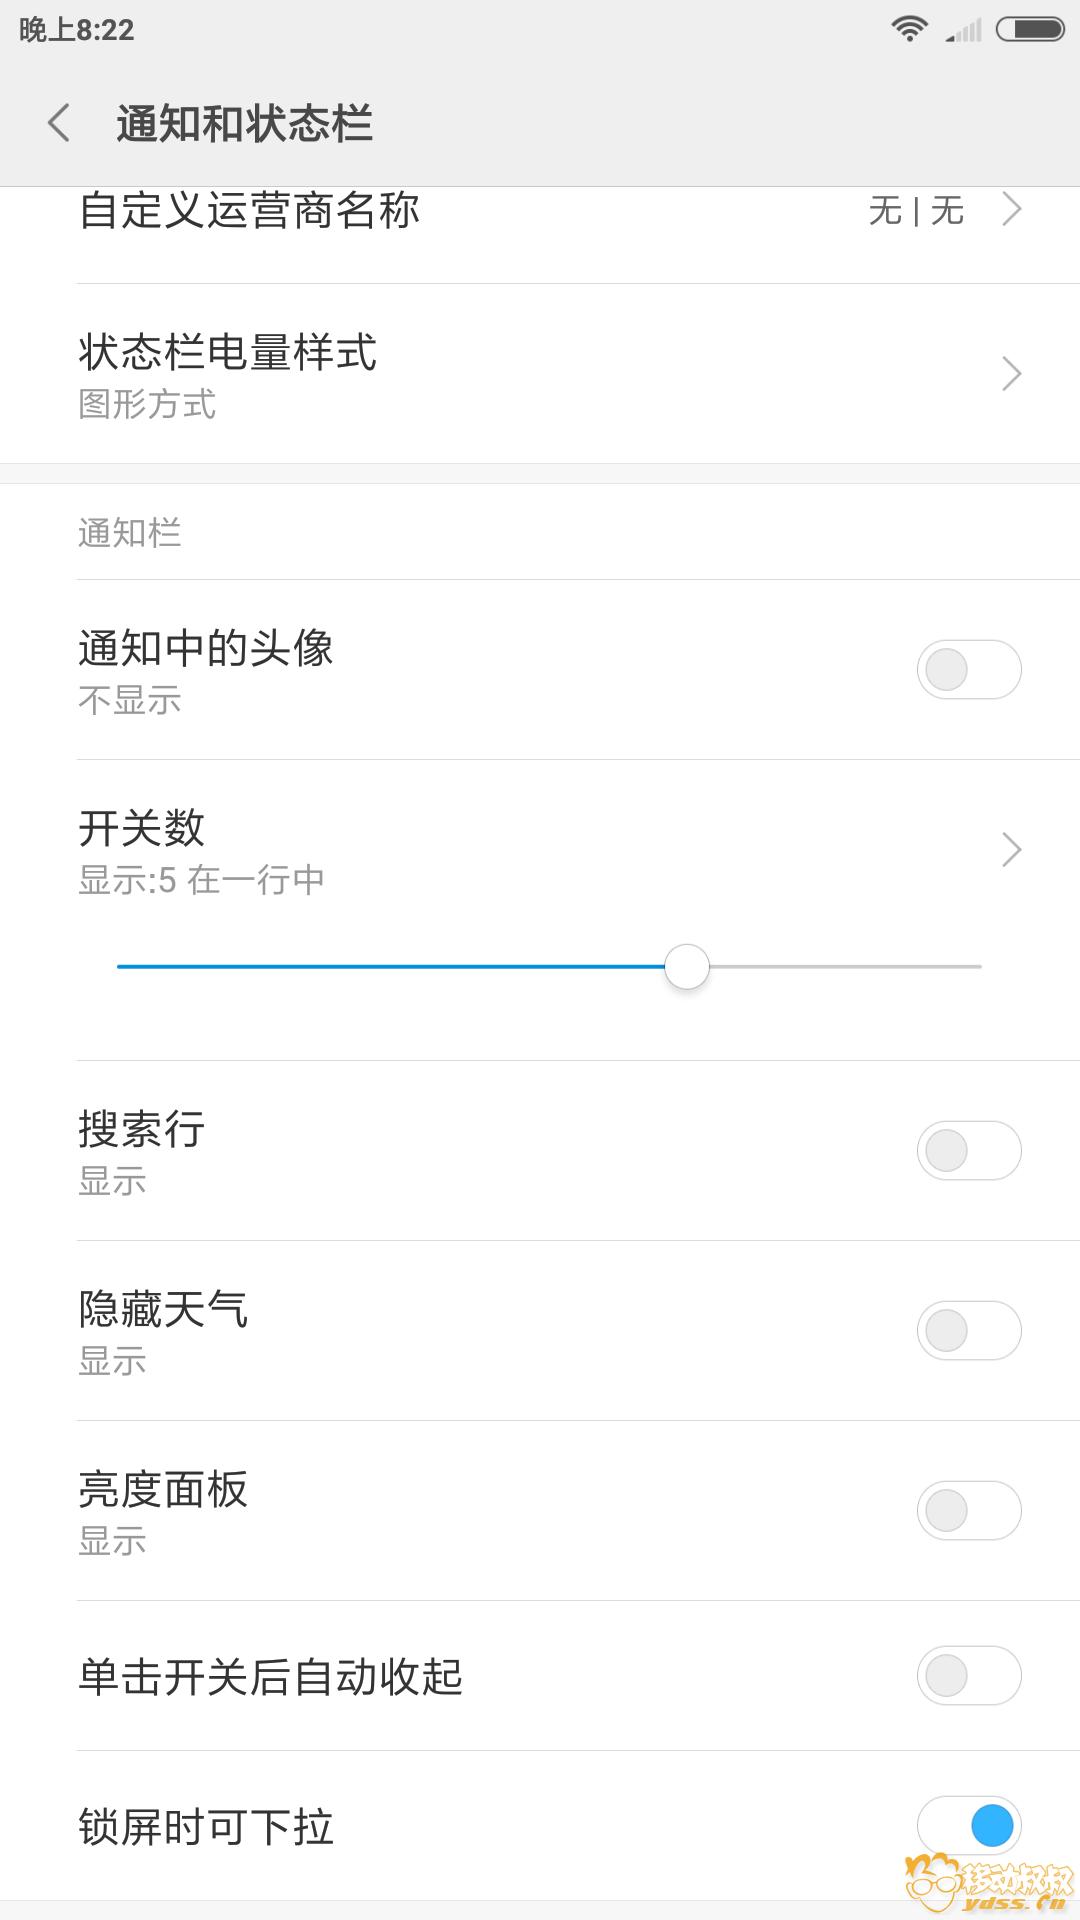 Screenshot_2018-02-28-20-22-26-009_com.android.settings.png